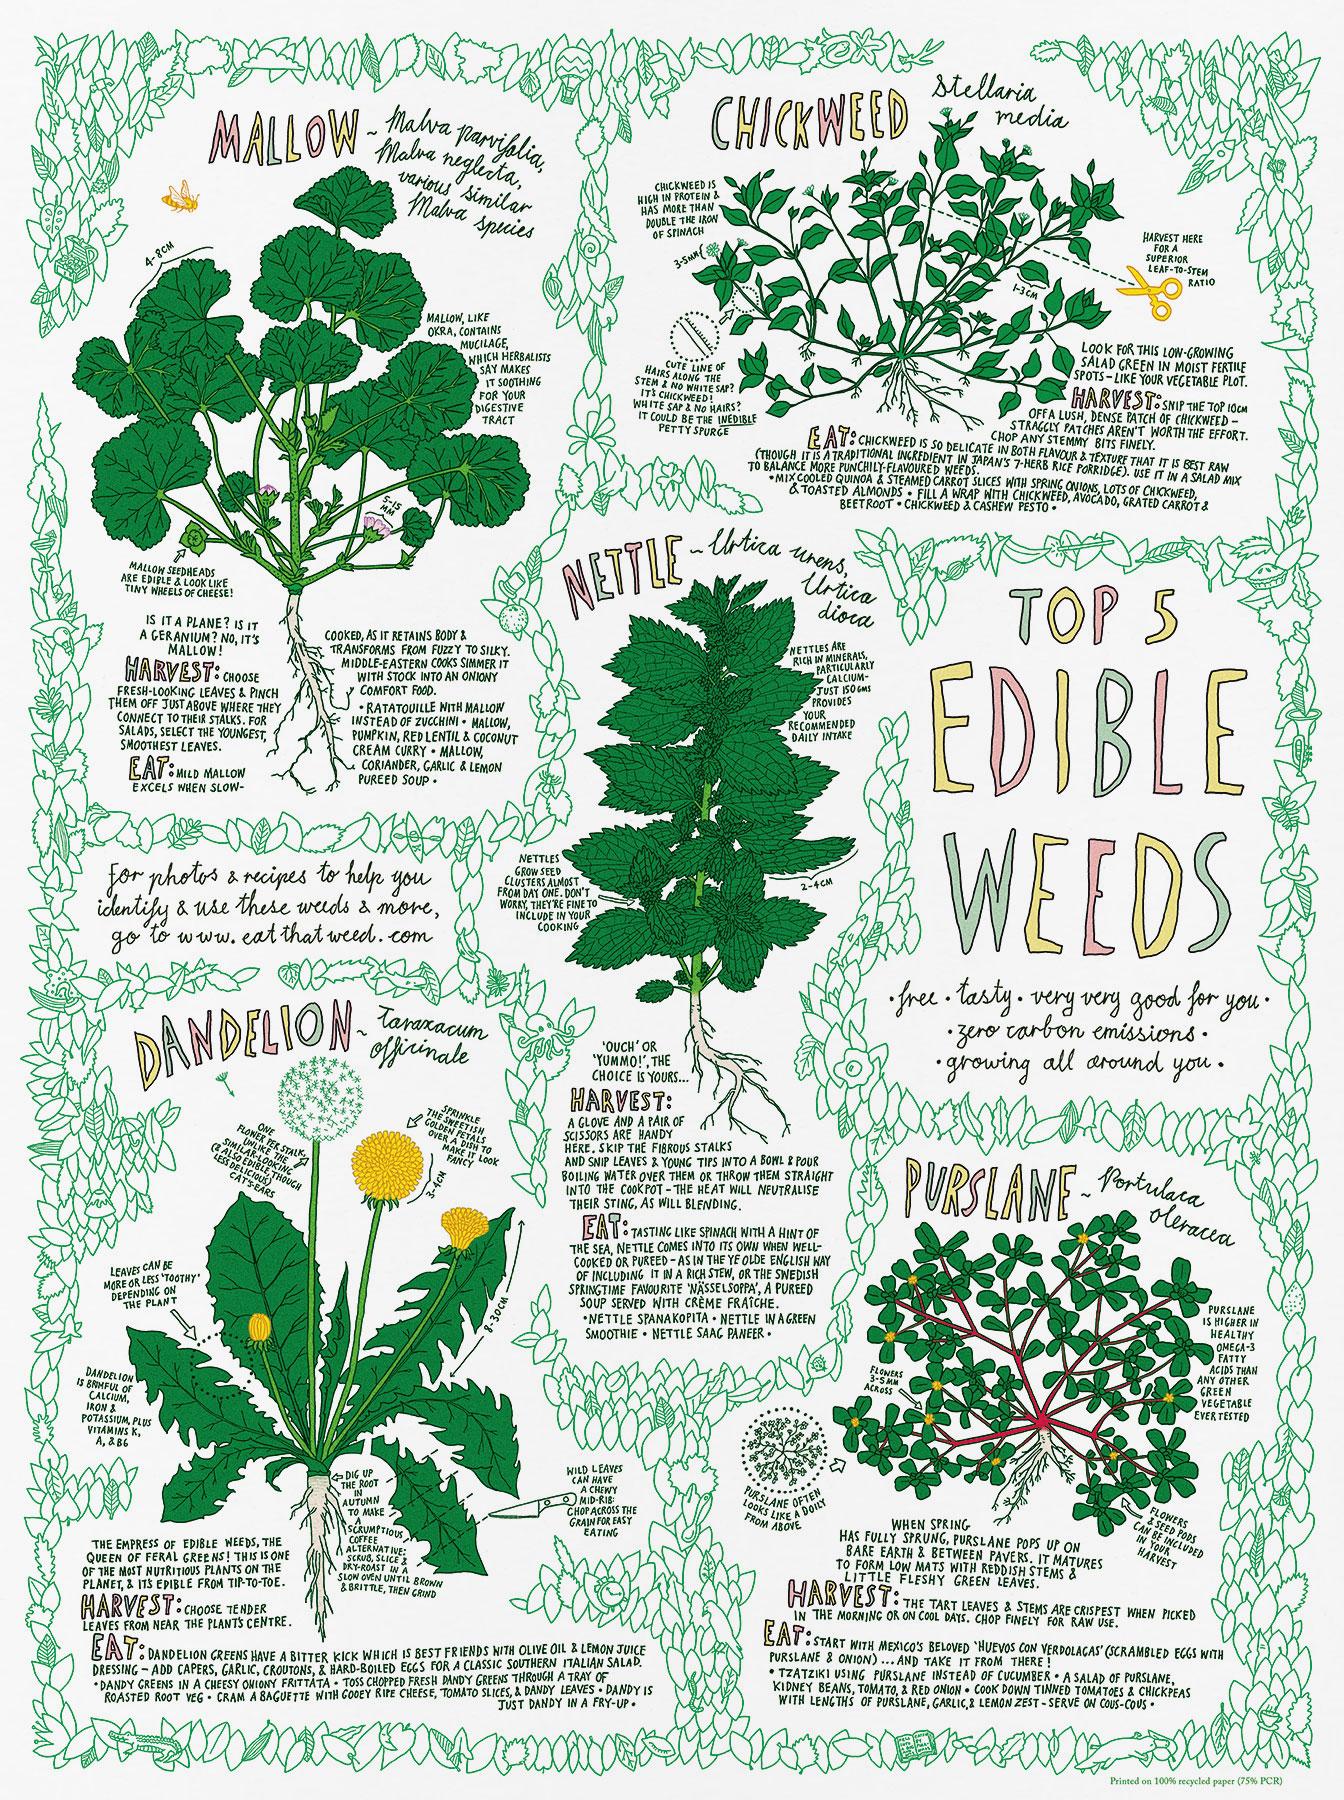 Top 5 Edible Weeds poster